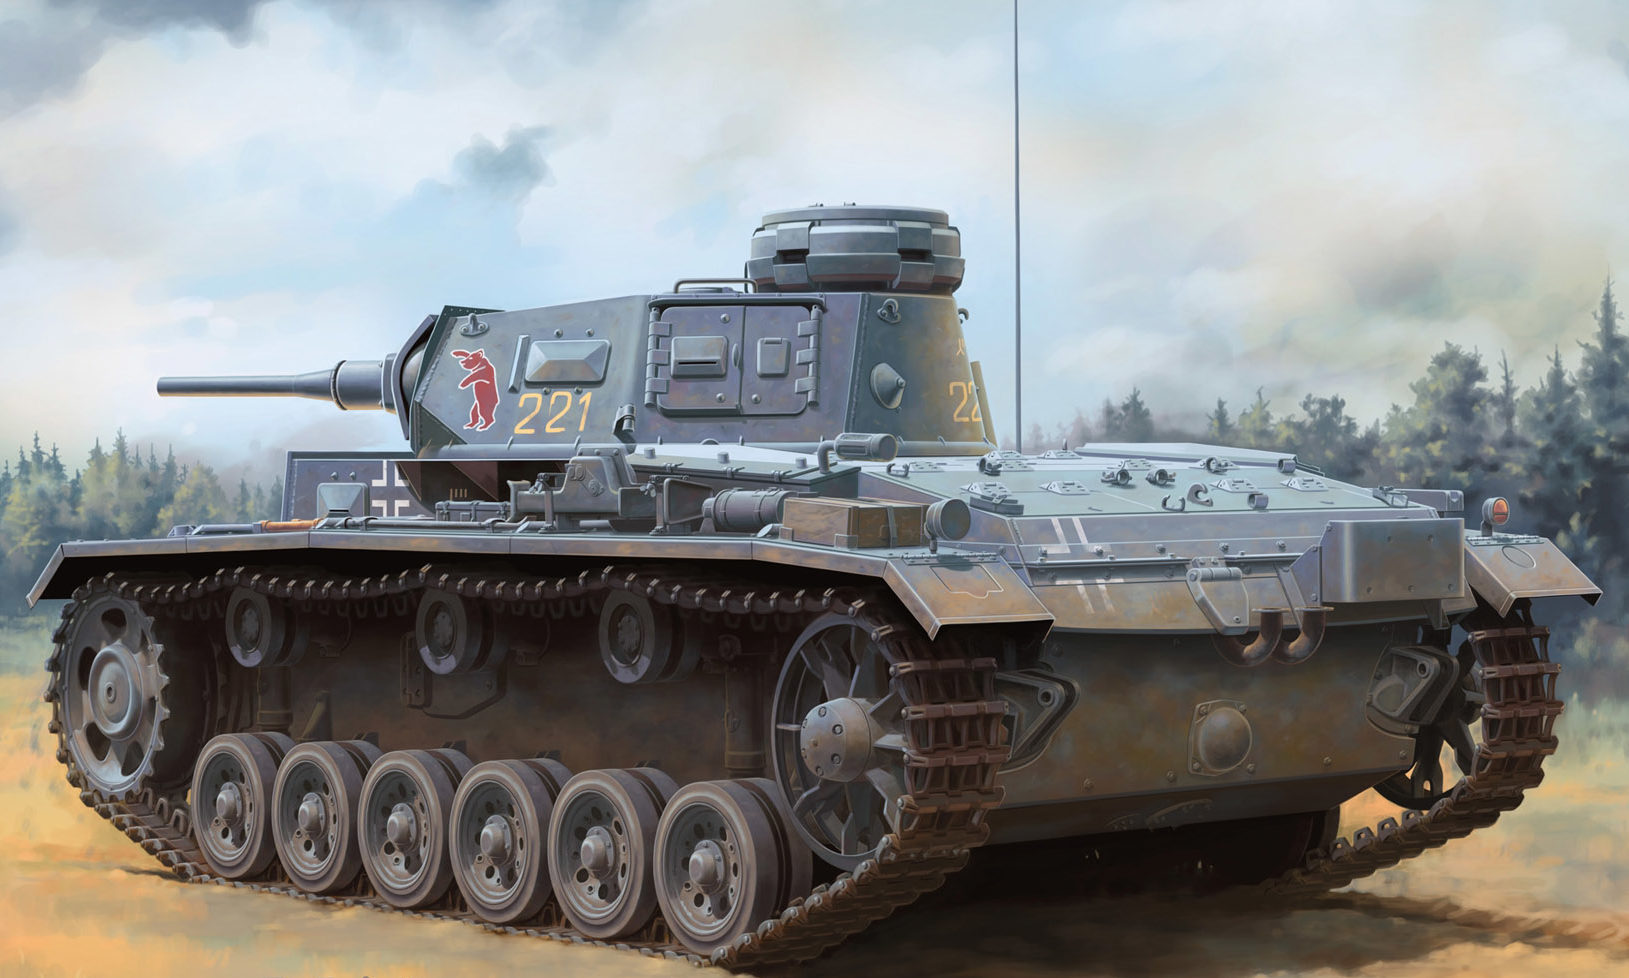 Zierfuss Filip. Танк Pz.Kpfw.III Ausf. H.